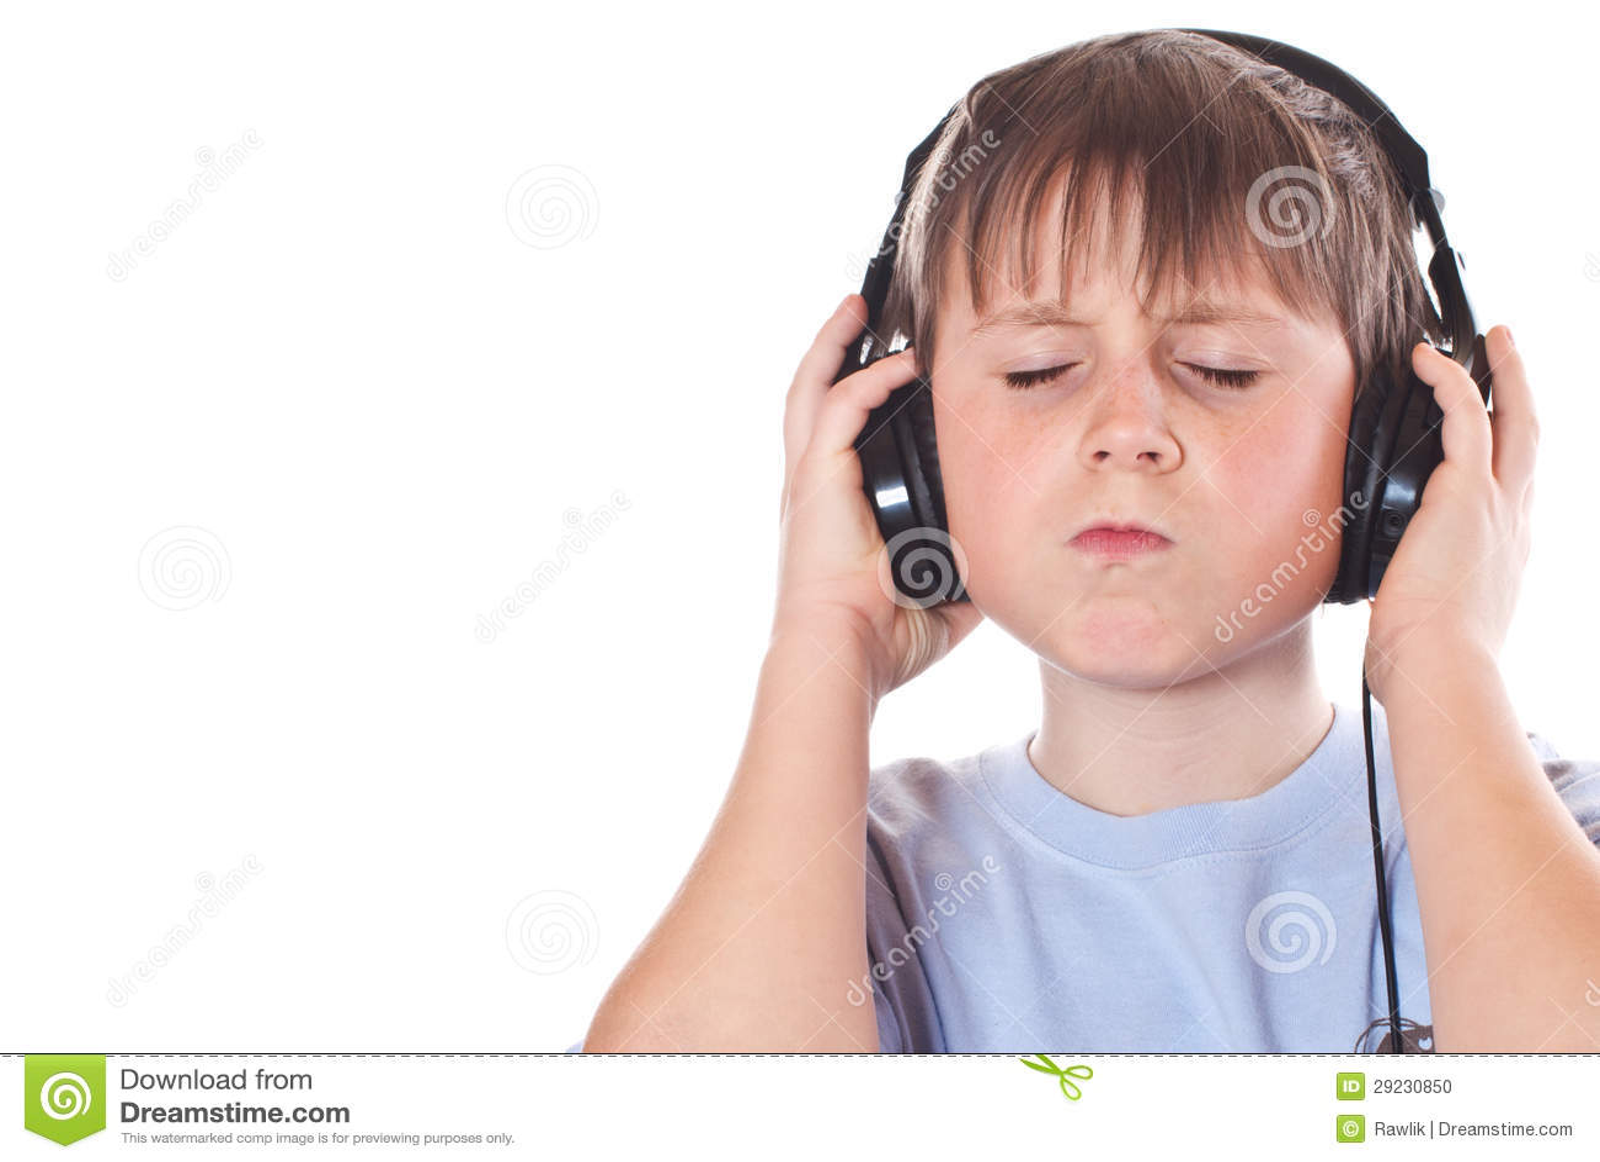 Boy Listening To Music With Headphones Stock Photo - Image ...